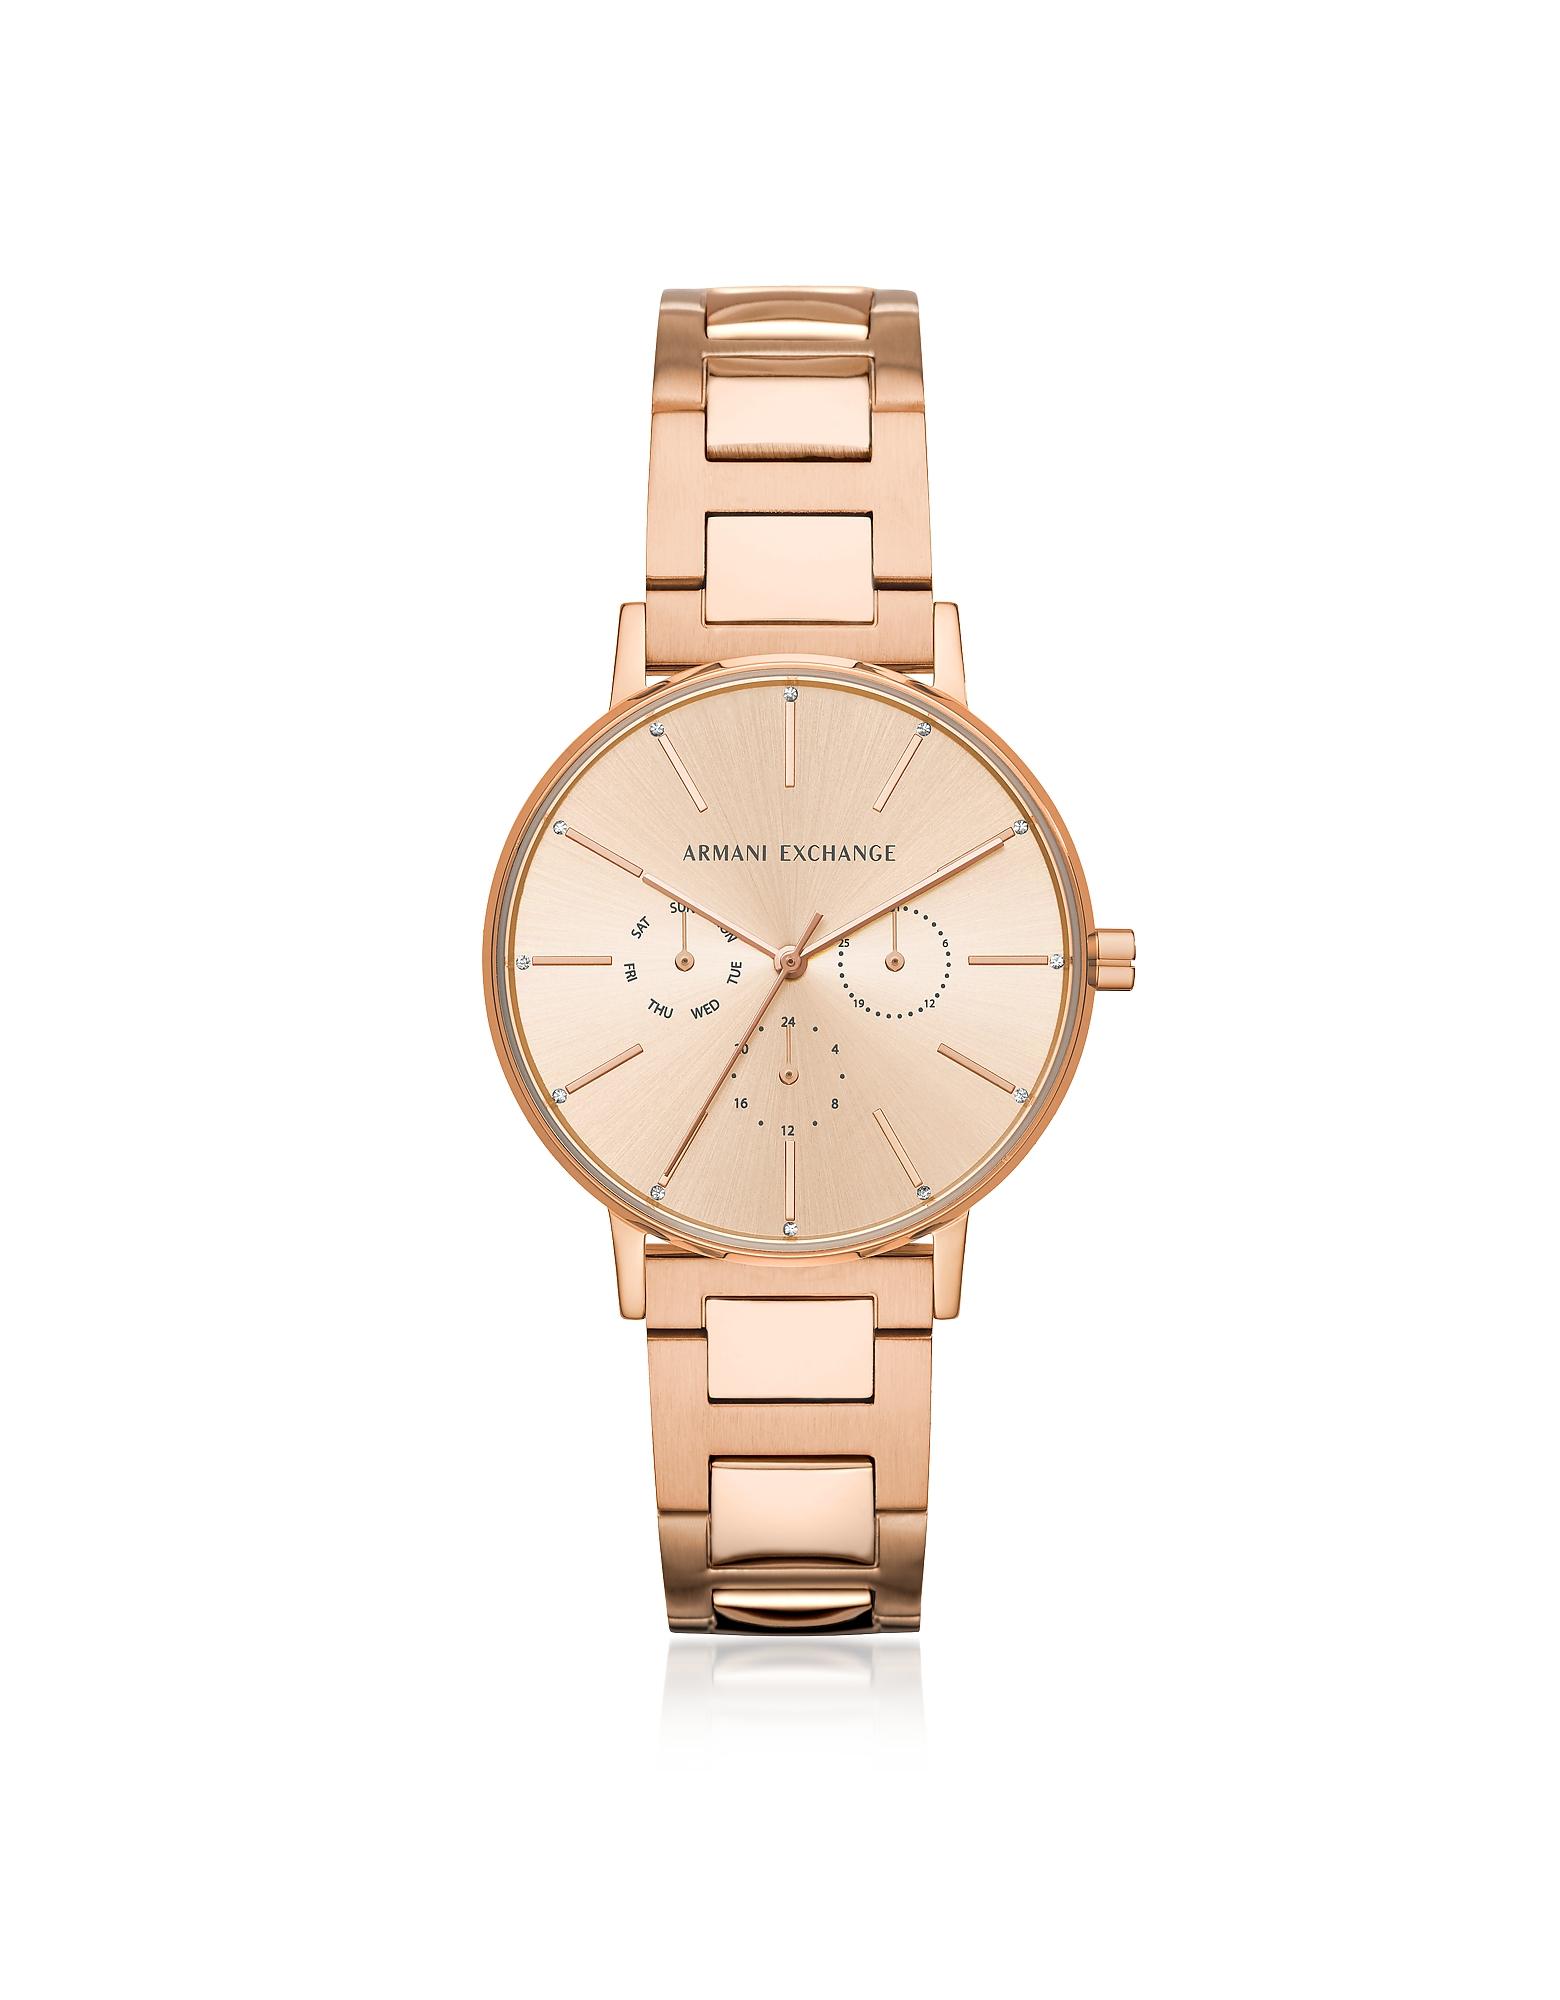 Emporio Armani Women's Watches, Lola Rose Chronograph Women's Watch